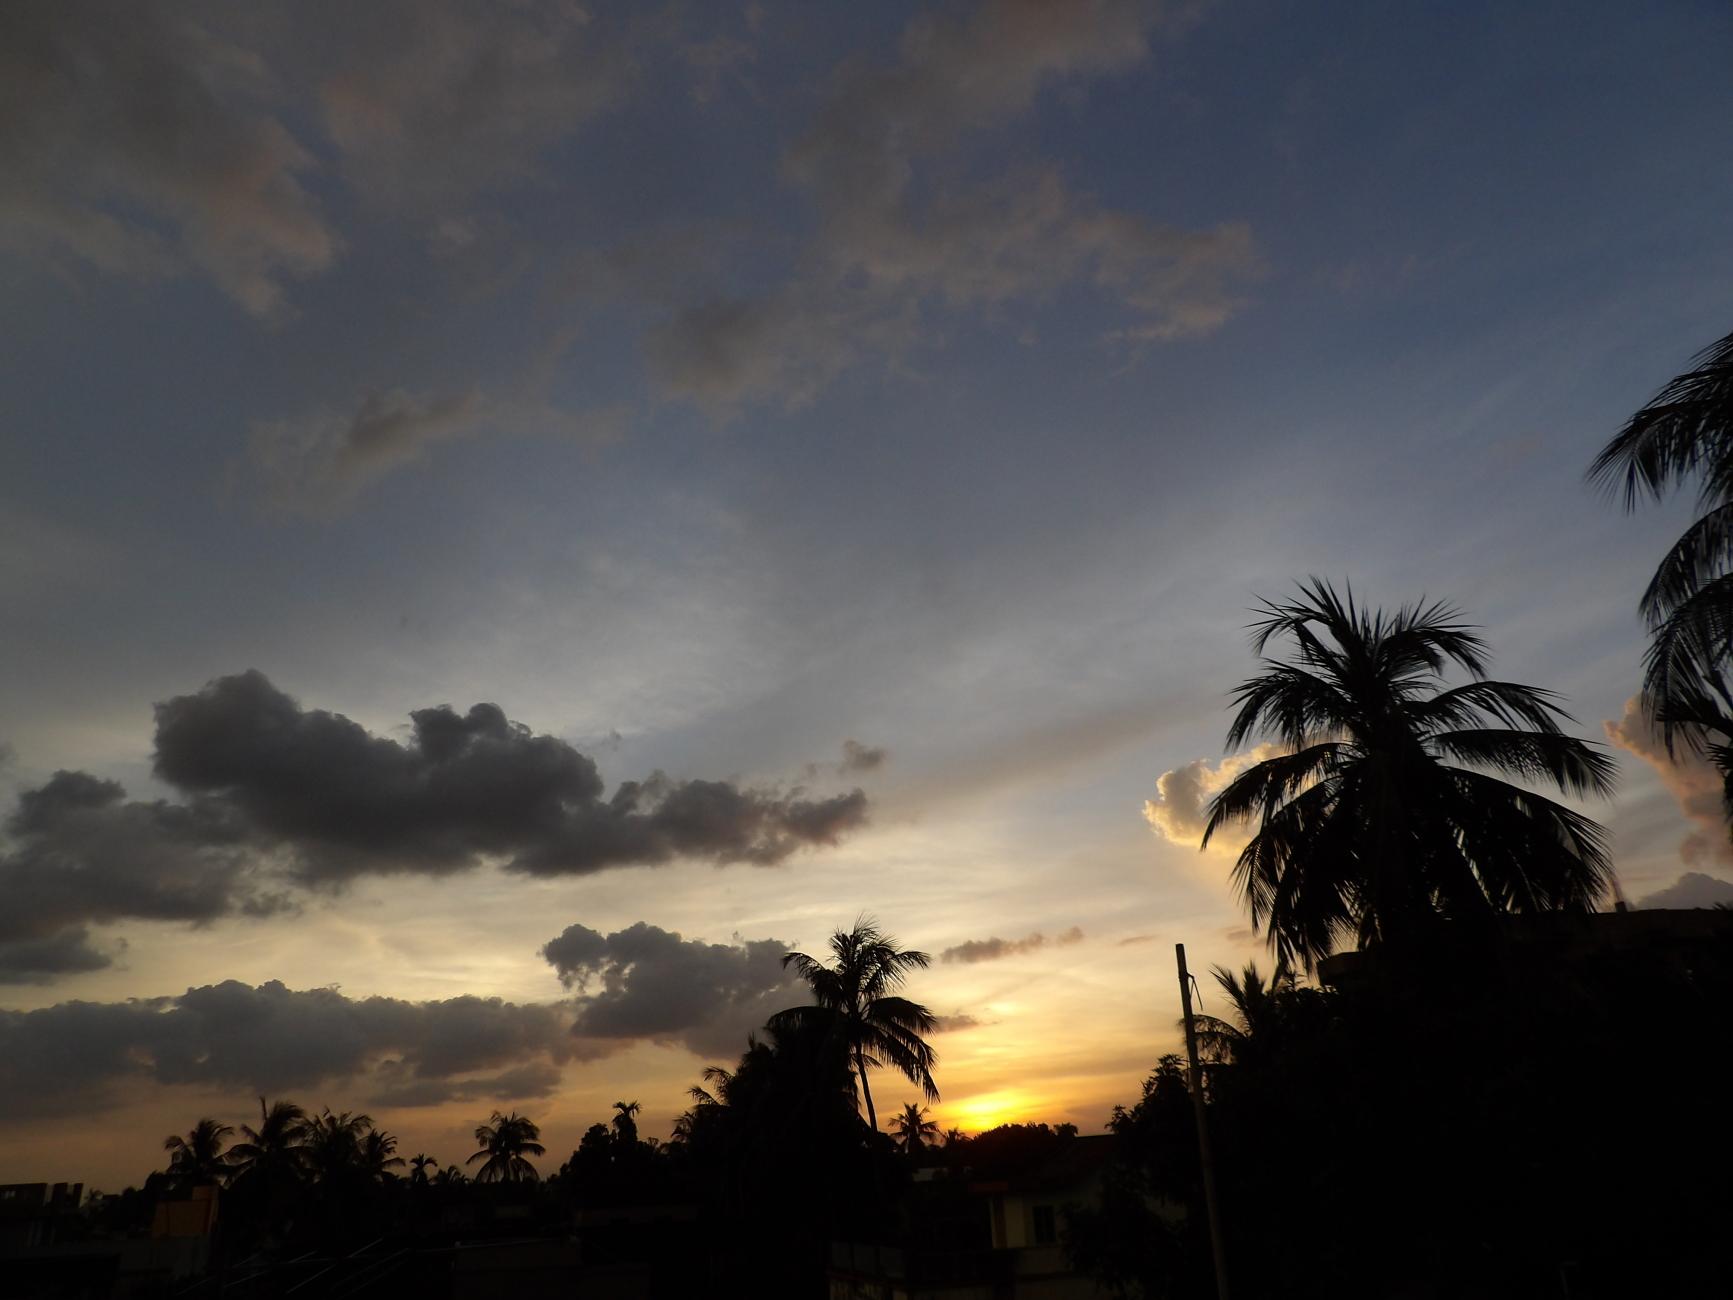 My Town Sunset.